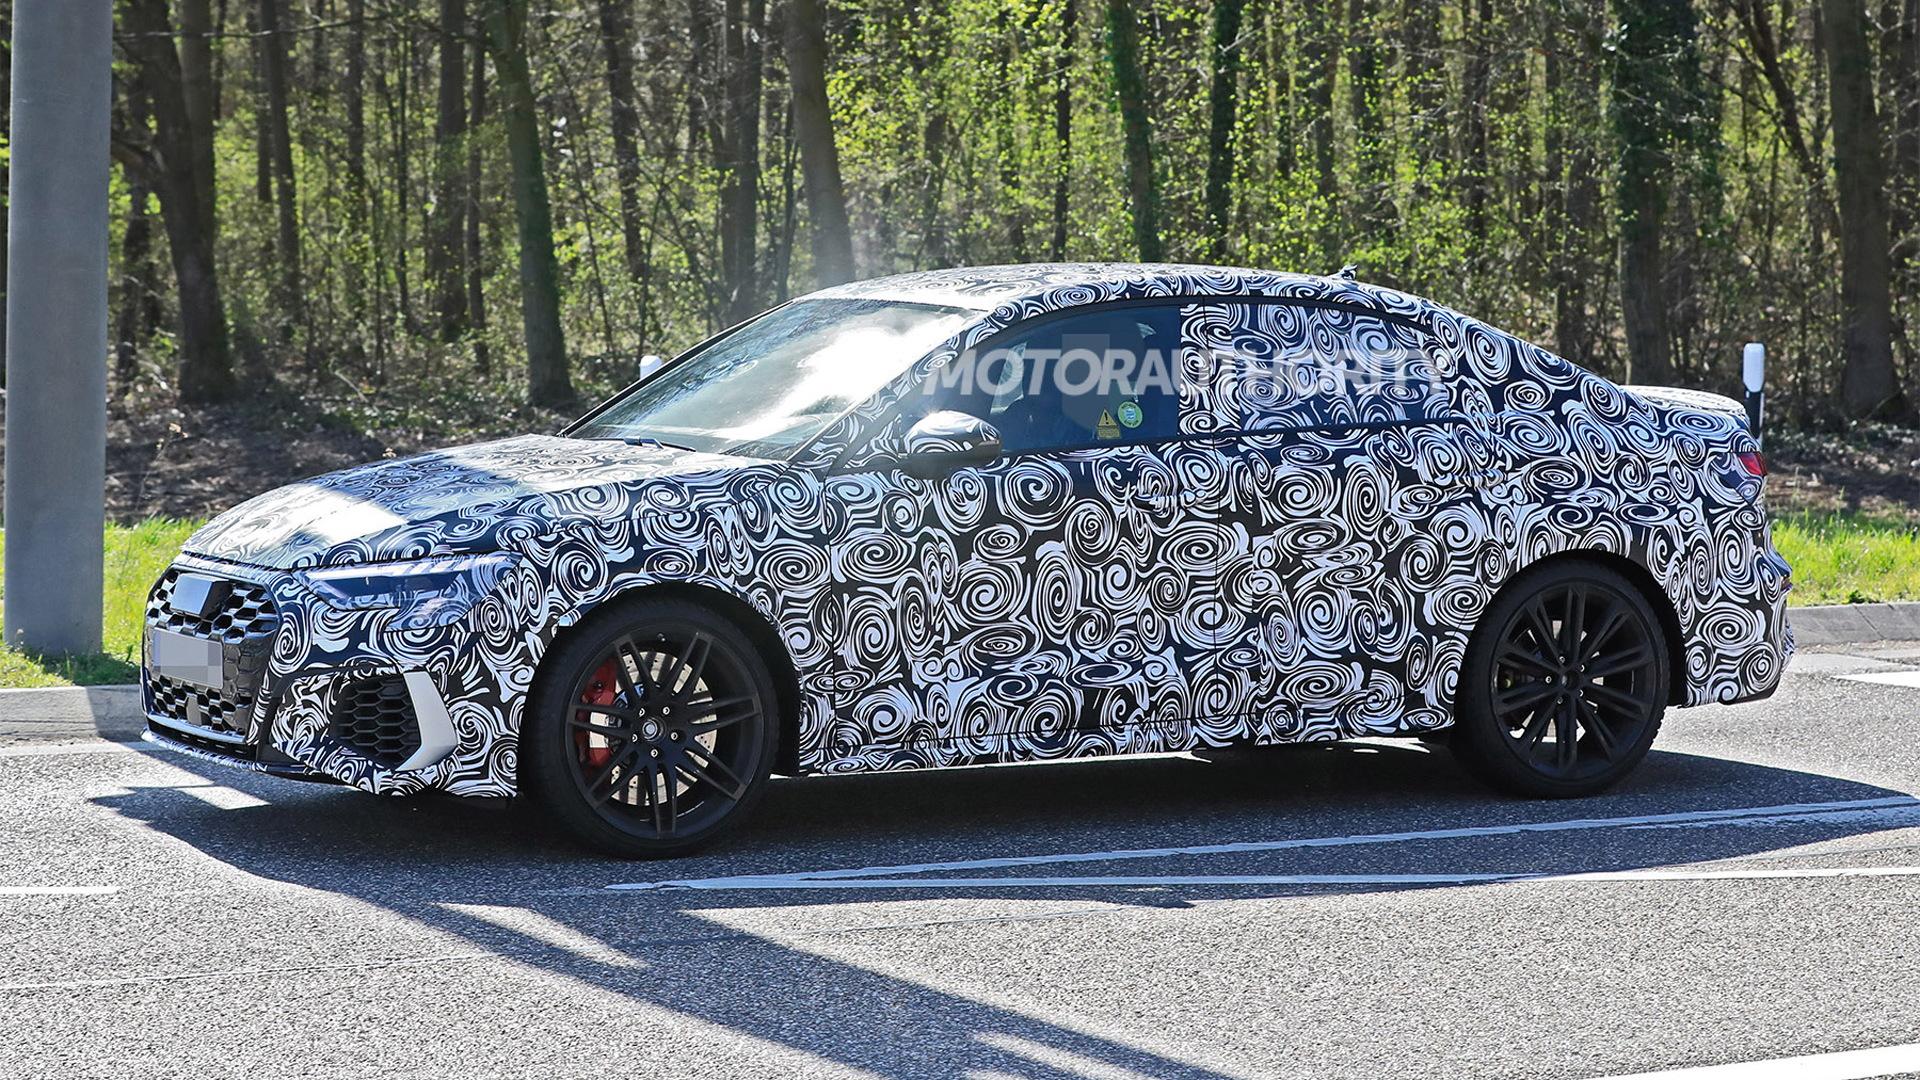 2022 Audi RS 3 spy shots - Photo credit:S. Baldauf/SB-Medien